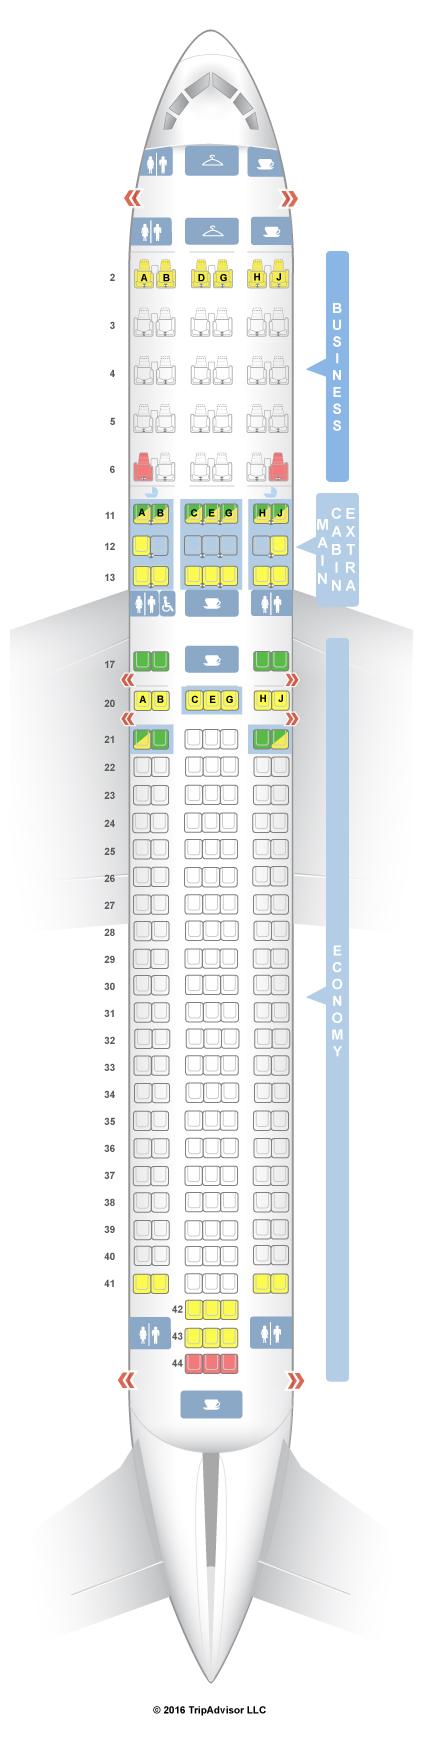 seatguru seat map american airlines boeing 767 300 763 v1